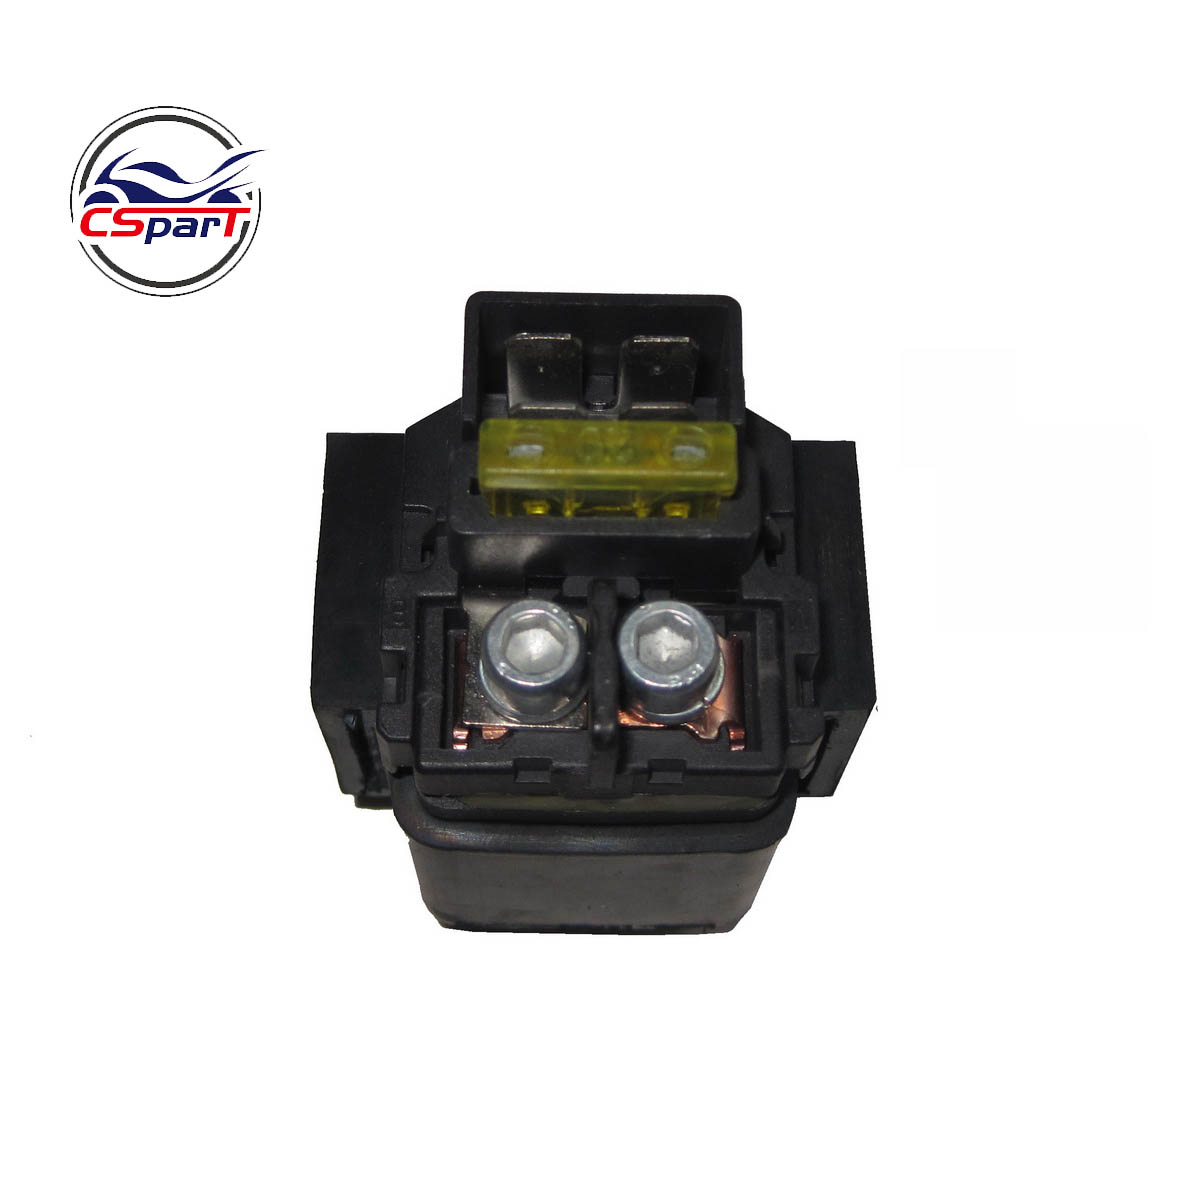 rele solenoide iniciante para linhai 250cc 300cc 400cc lh250 yp250 300t b buyang fa d300 h300